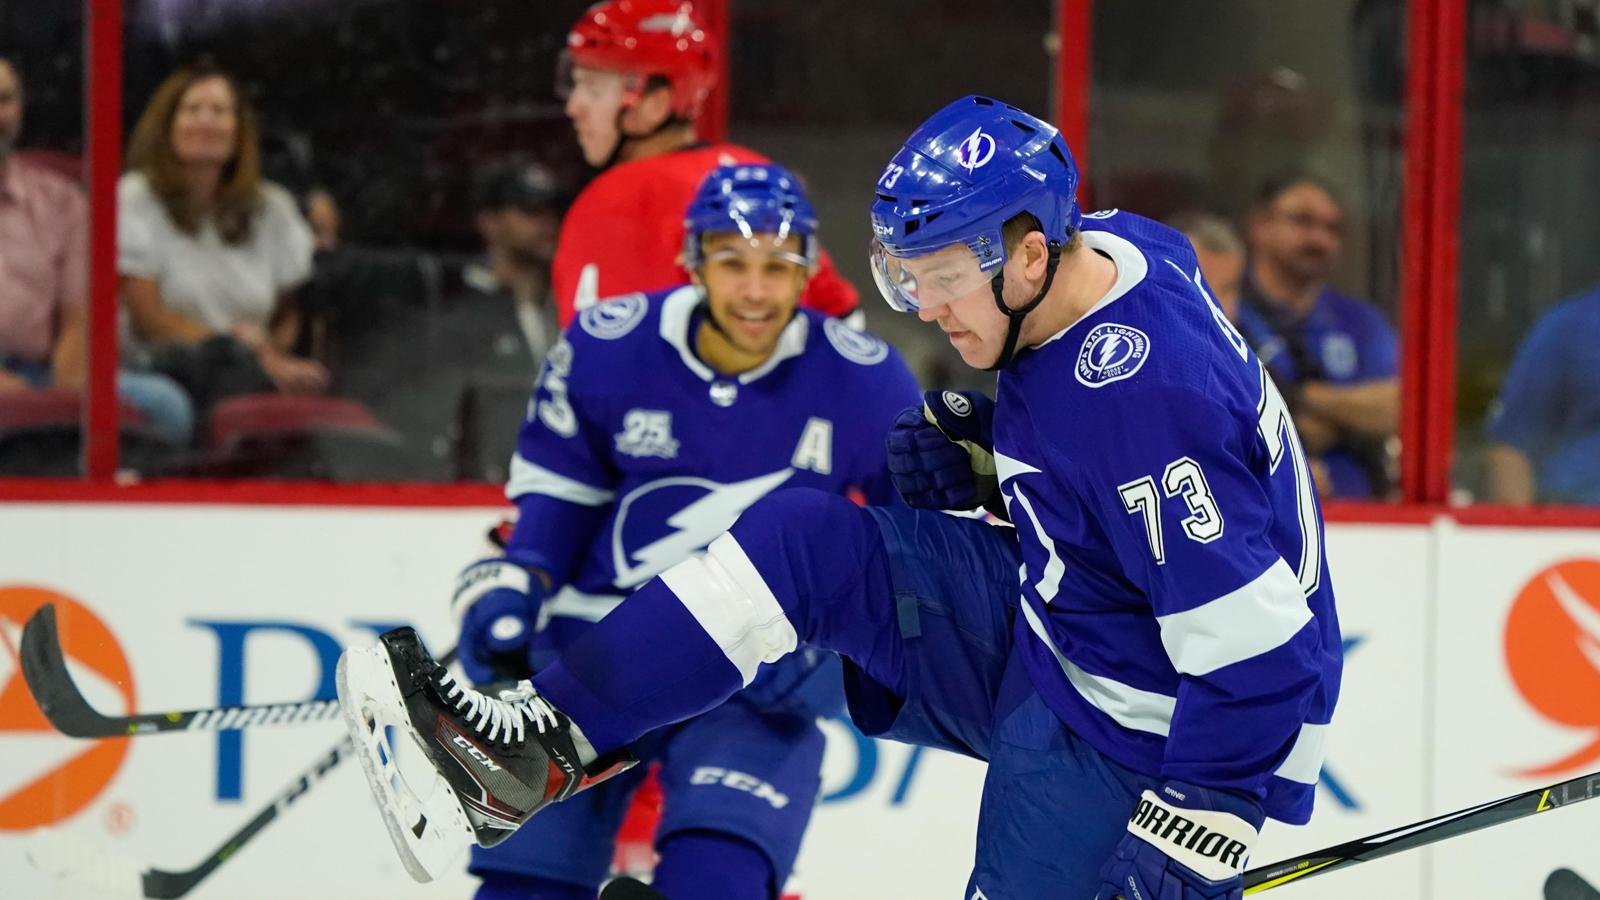 Adam Erne, Mikhail Sergachev lead Lightning past Hurricanes in preseason